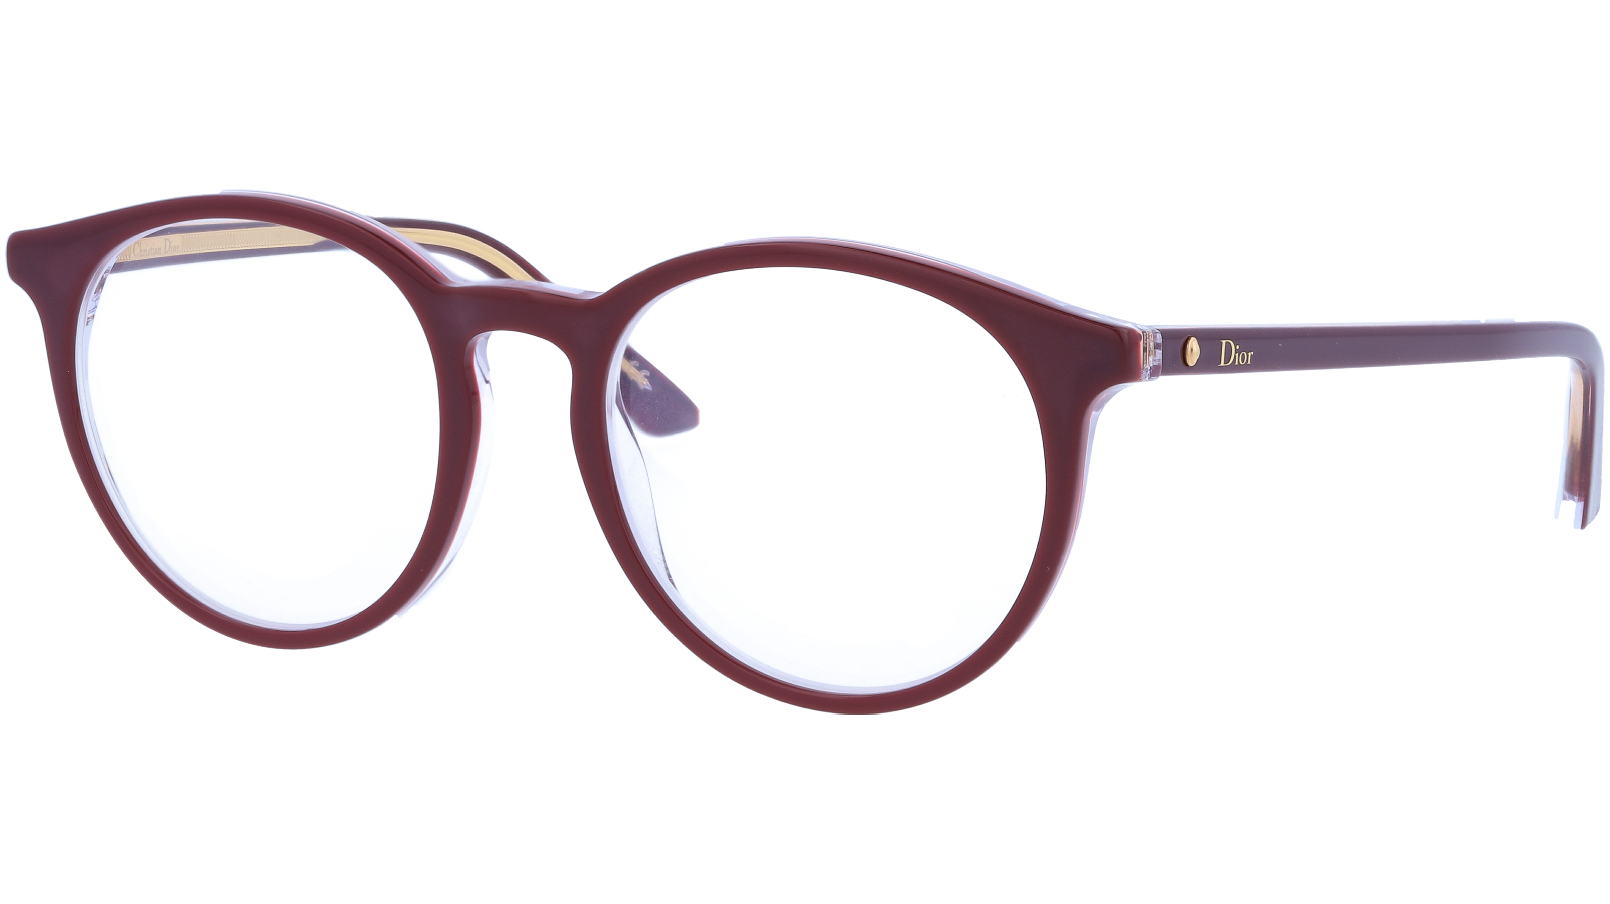 Dior MONTAIGNE15 MVG 50 BurgunDY Glasses